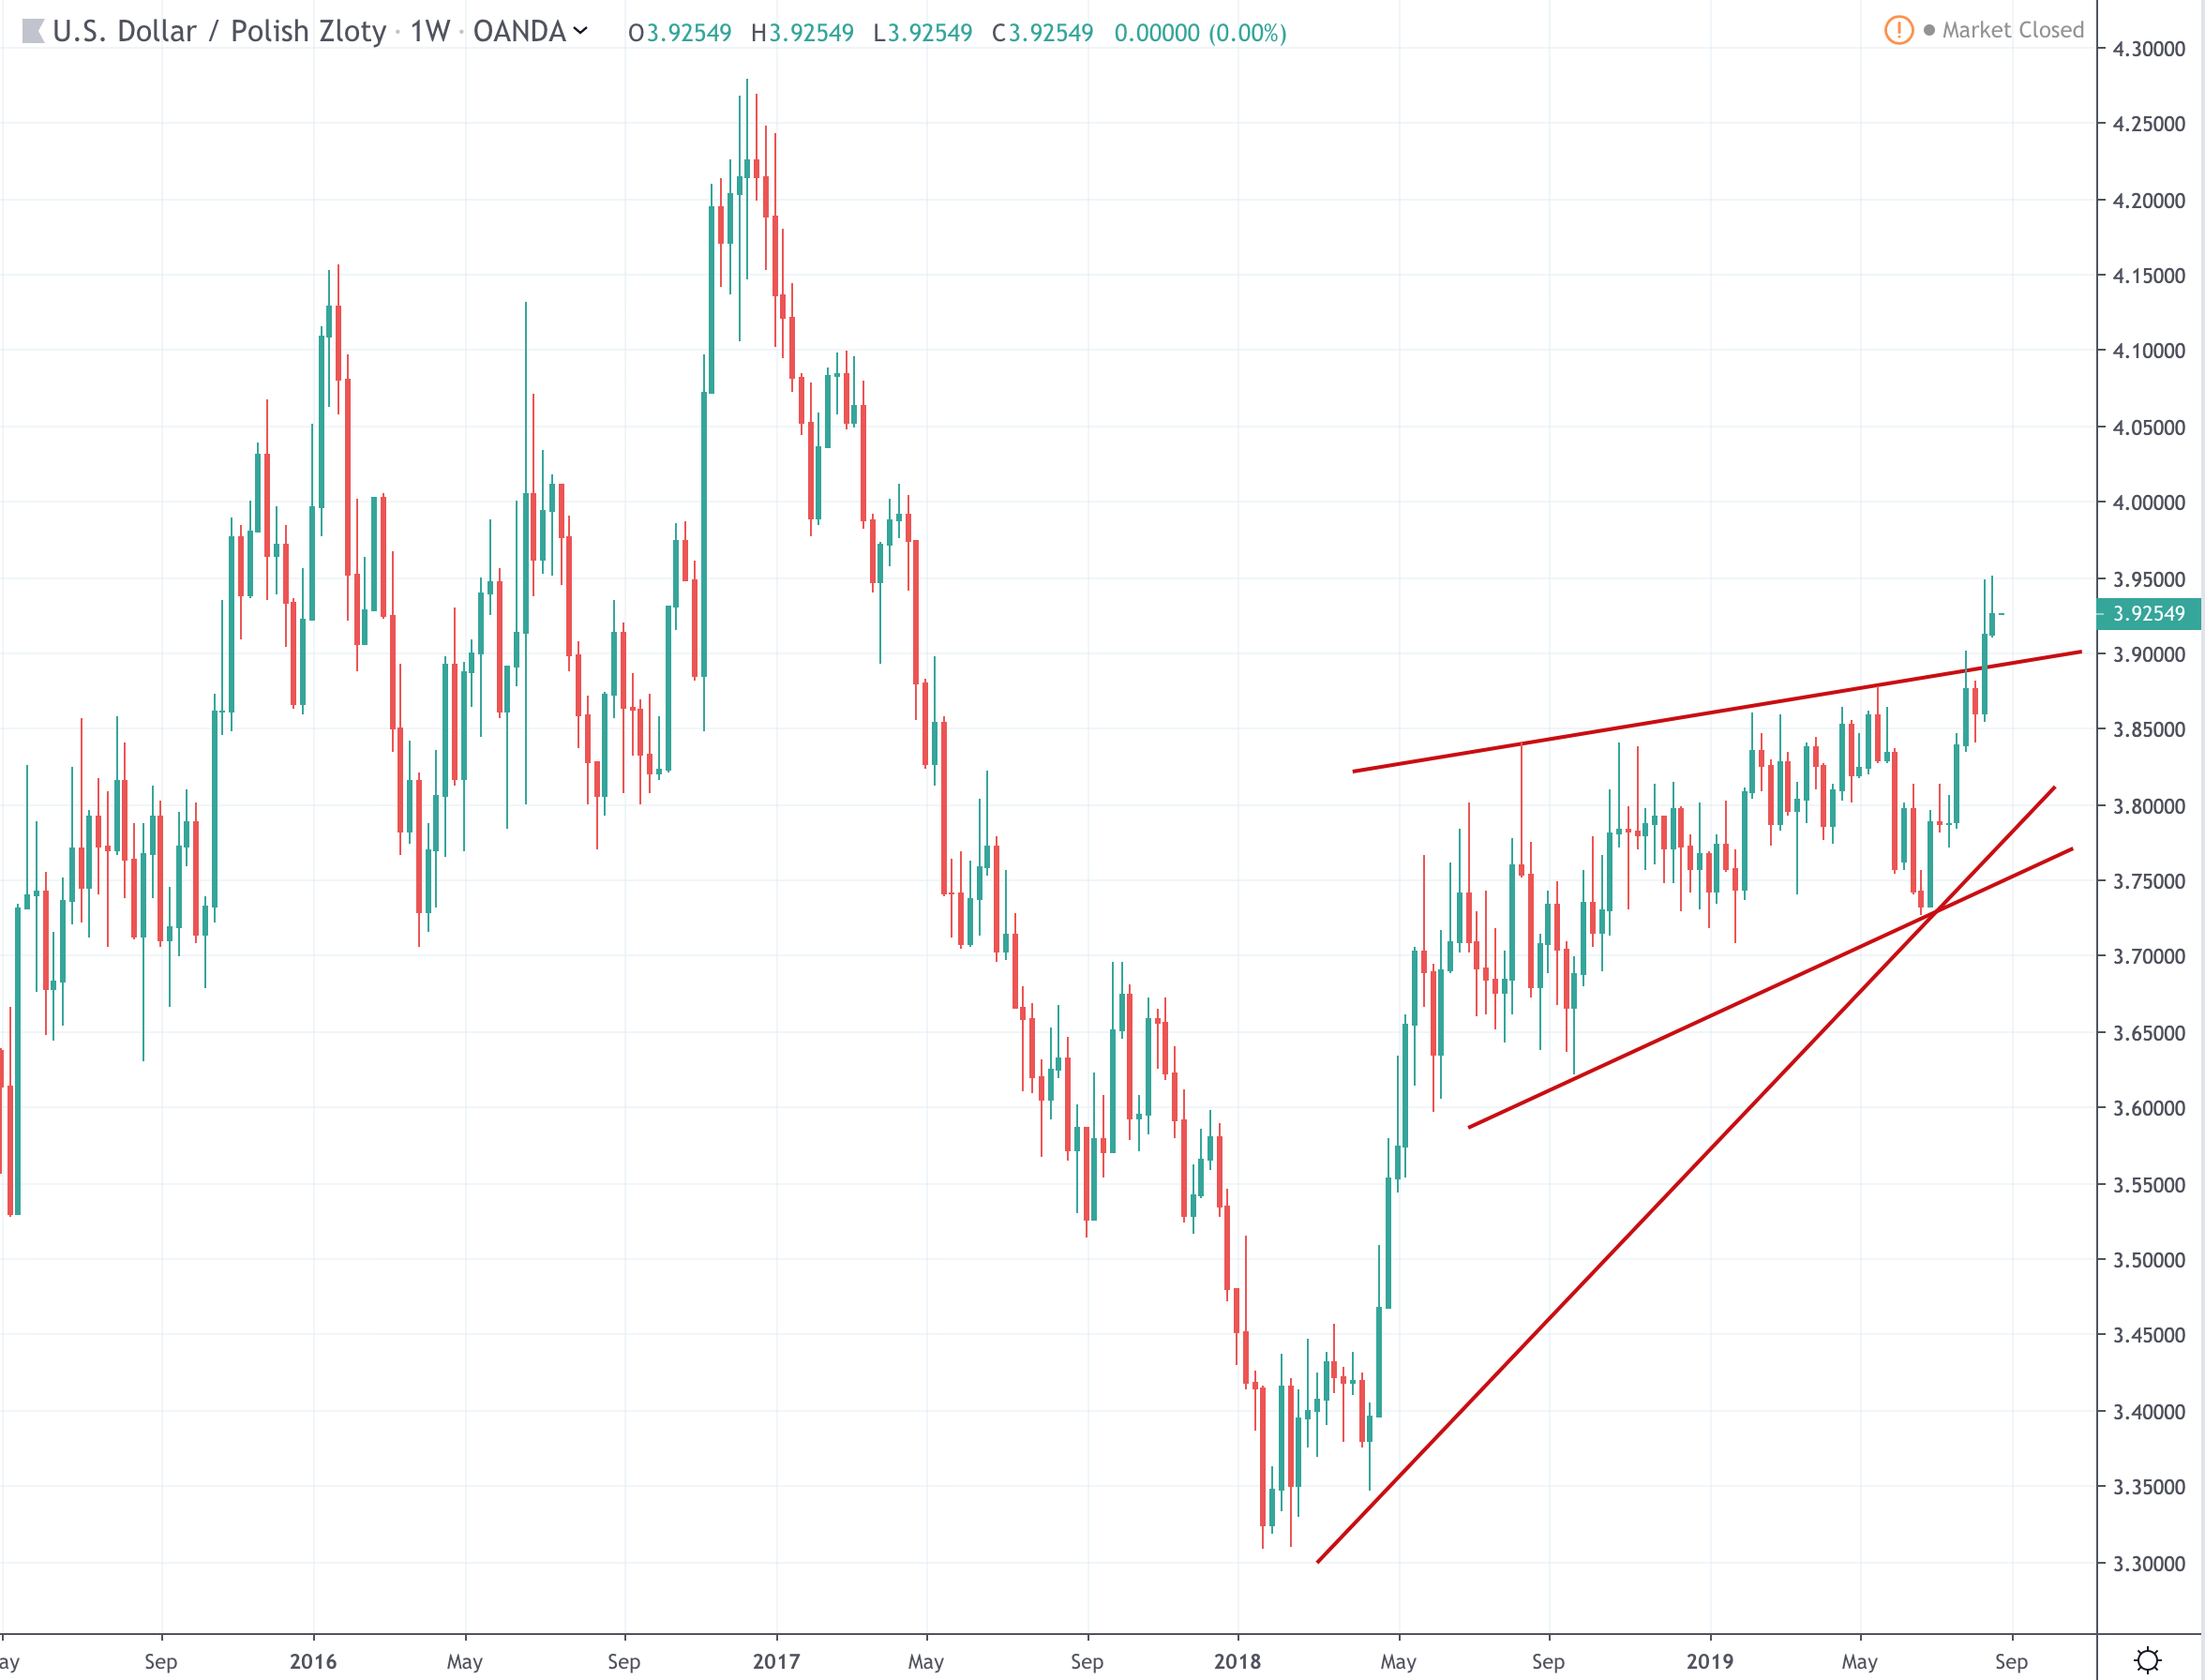 Dollar Zloty USD / PLN Chart